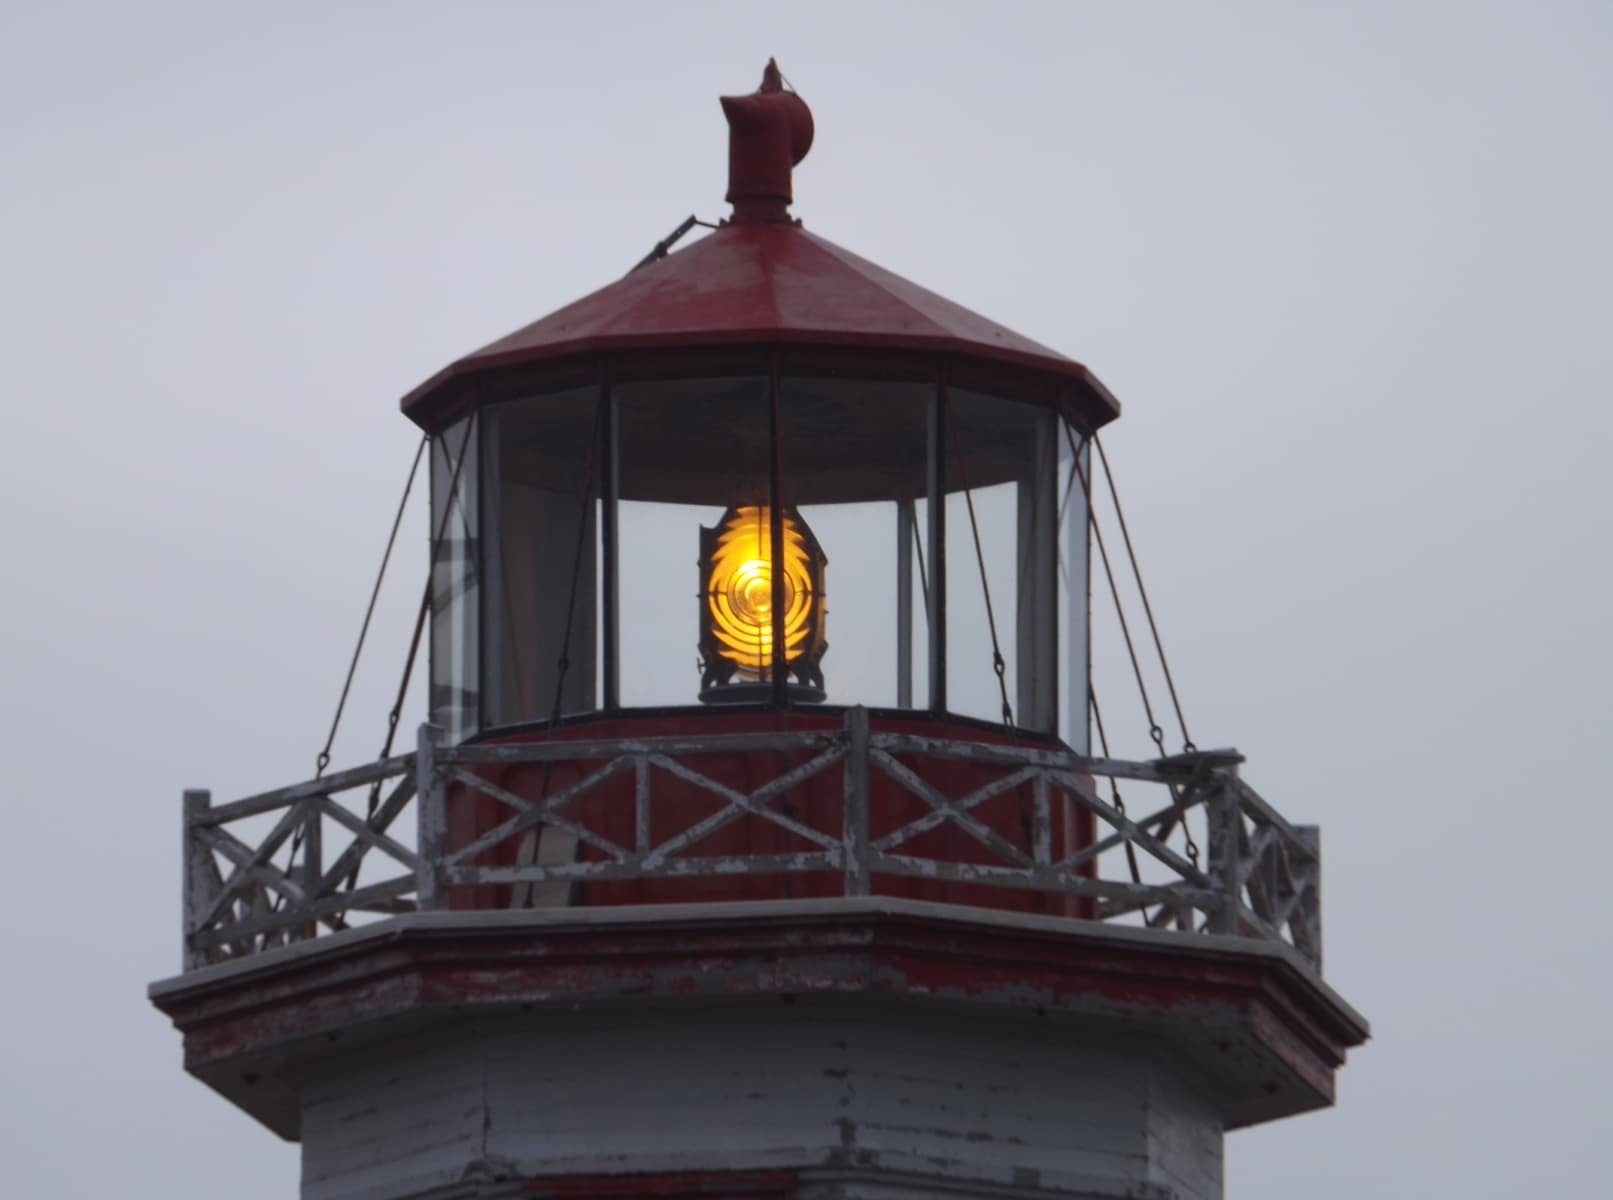 North-Cape-Lighthouse-DSCF5913